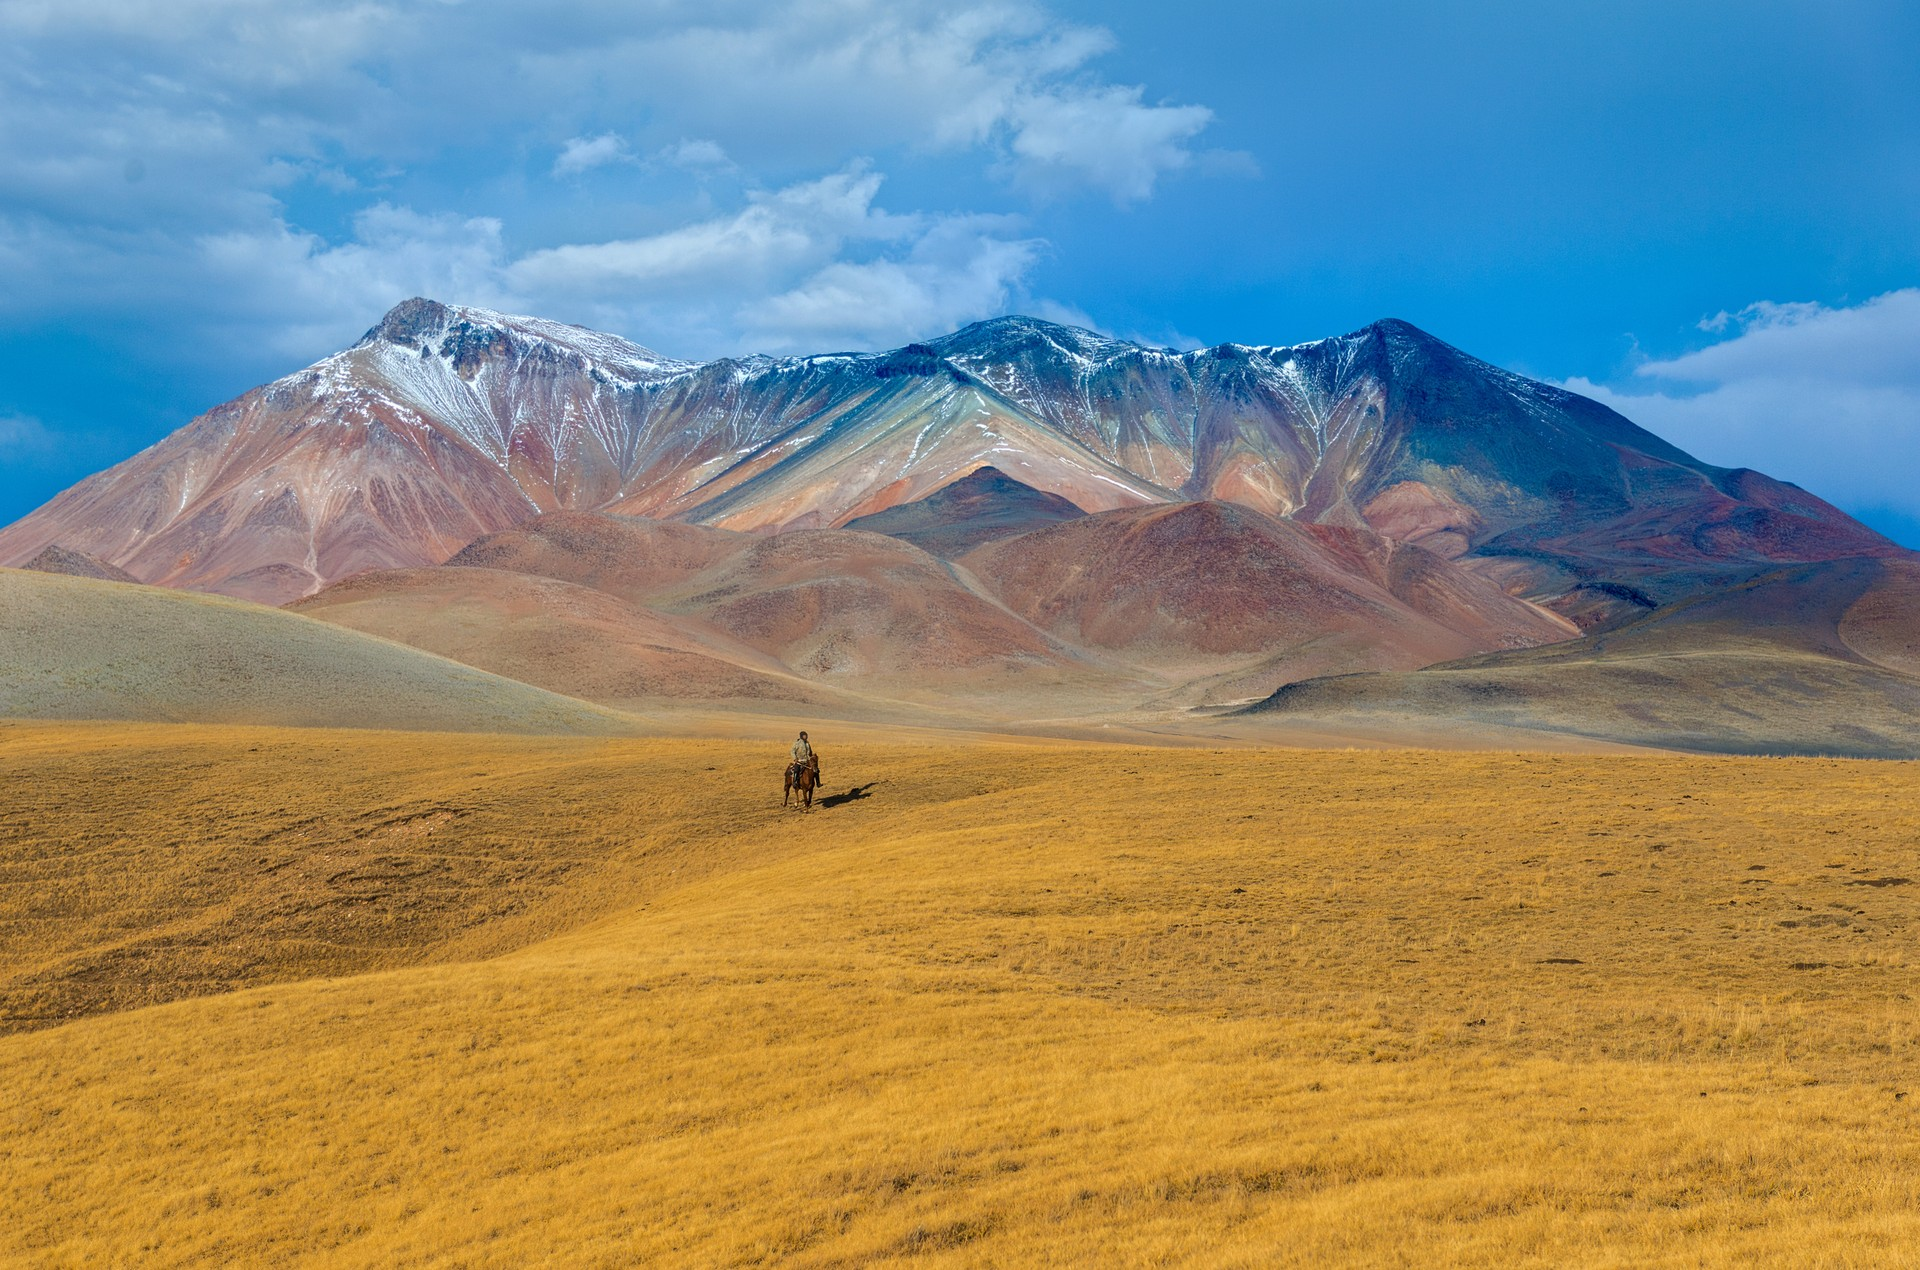 Nomad riding on Kazakhstan steppe